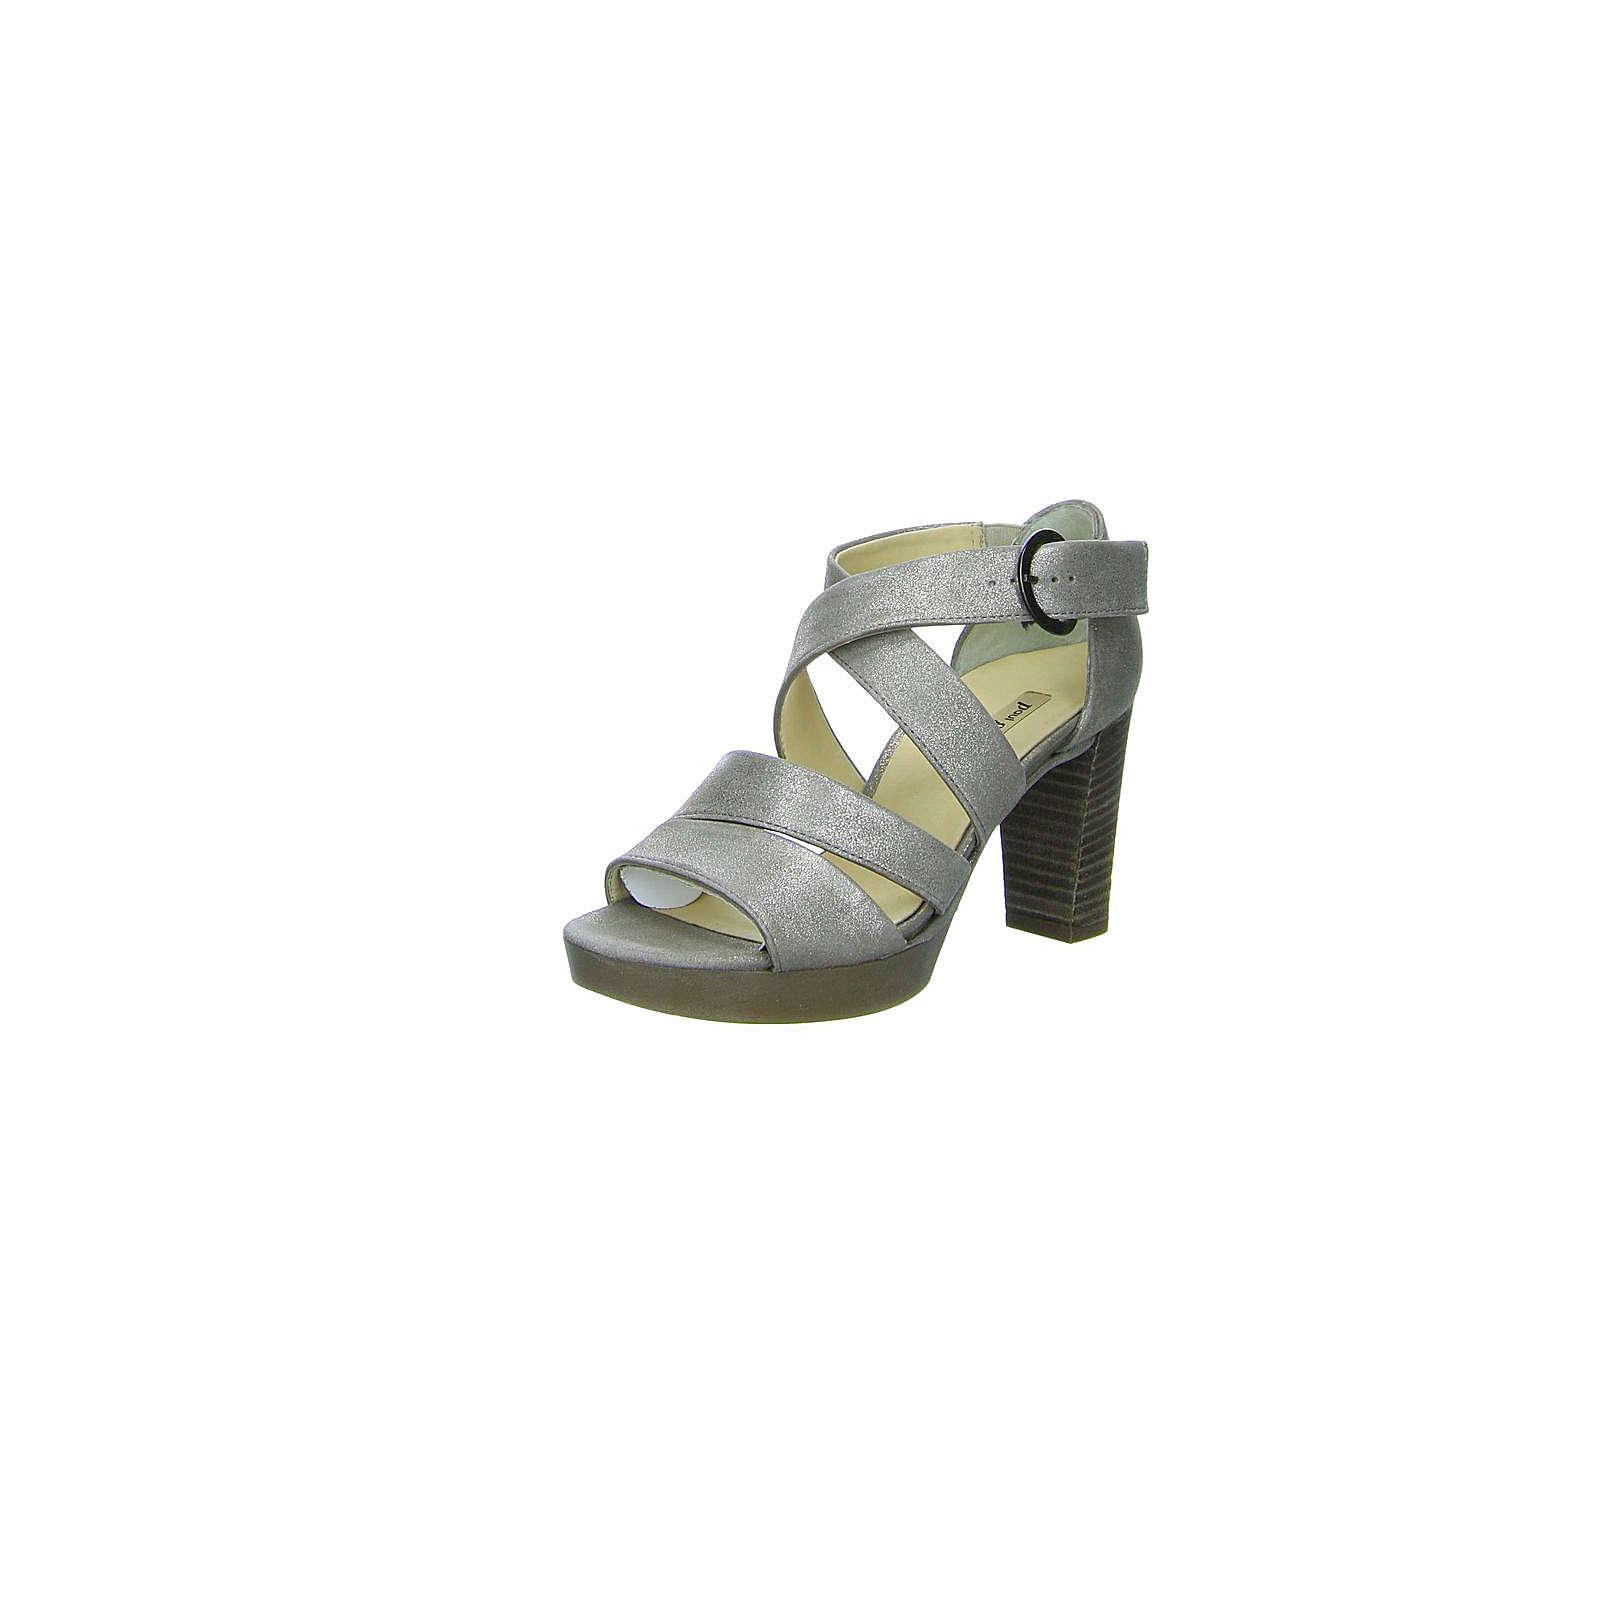 Paul Green Klassische Sandaletten beige Damen Gr. 38,5